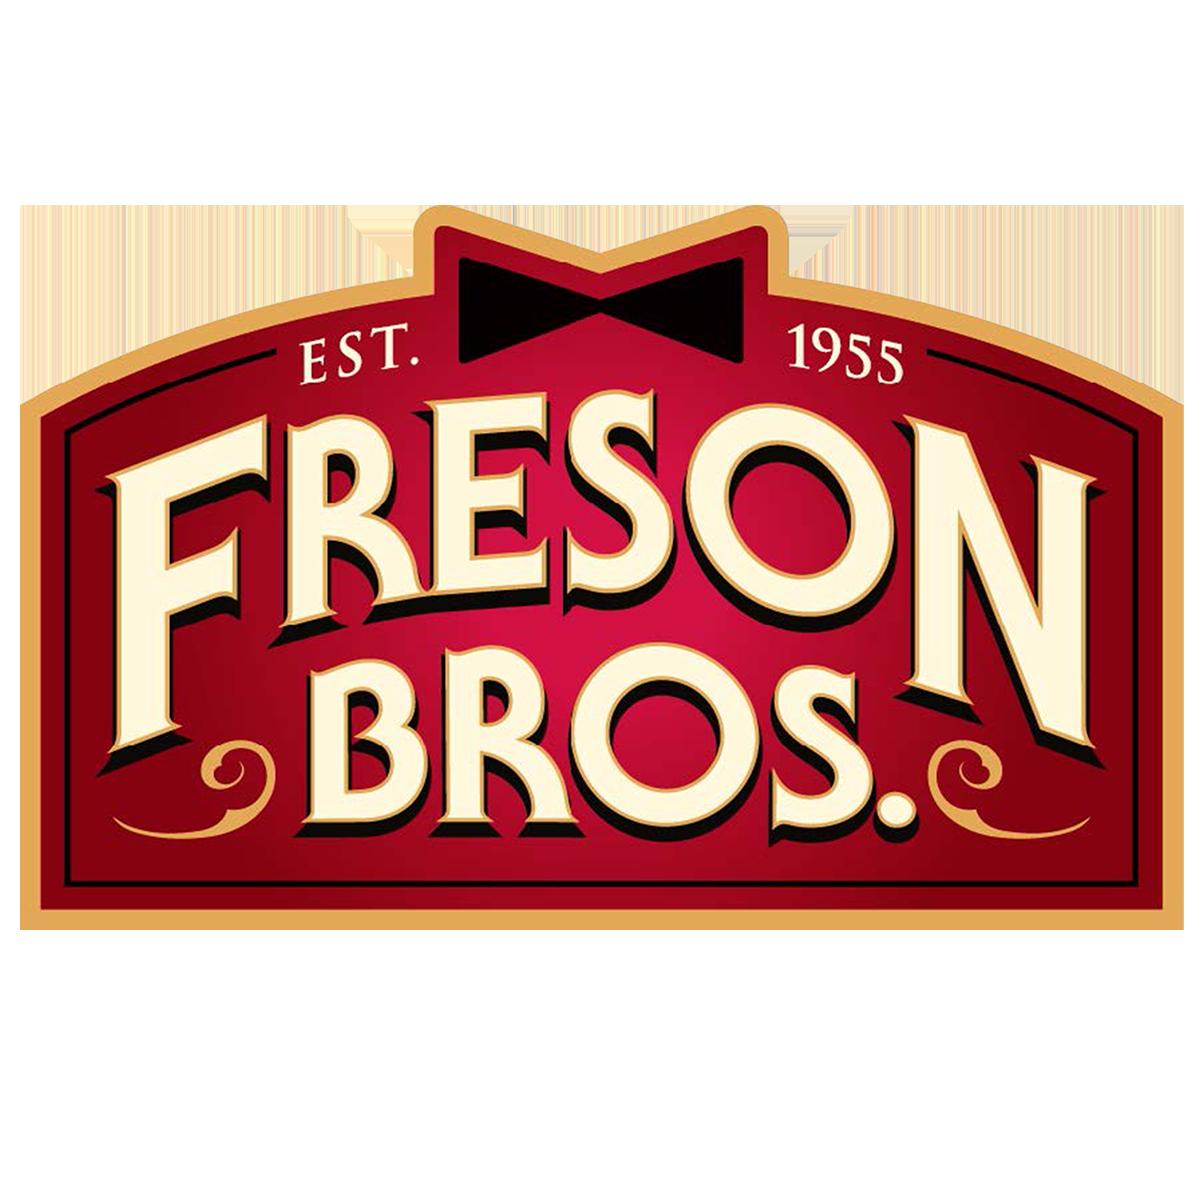 Blueberry Bluegrass Festival - Freson Bros